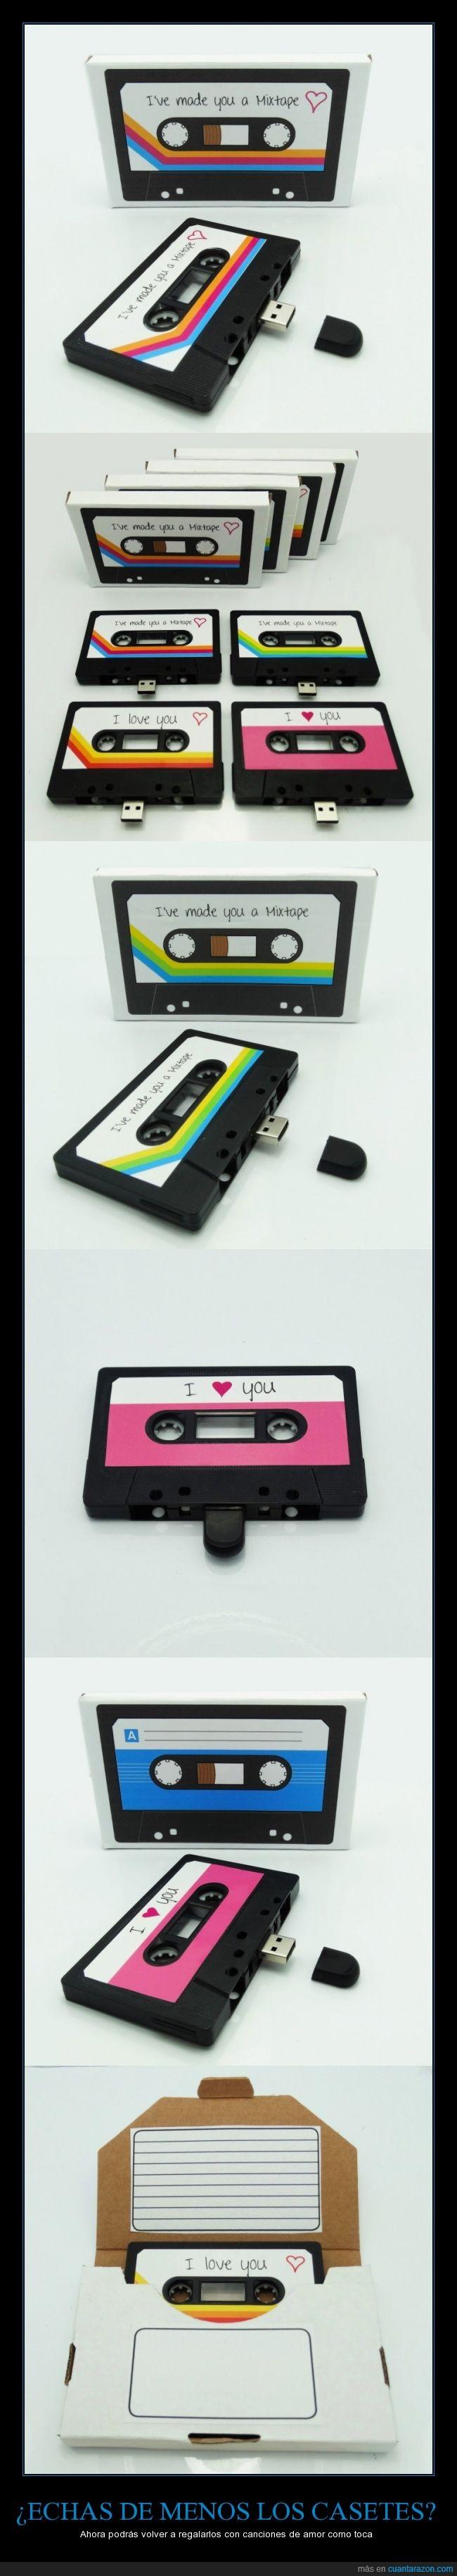 amor,casete,enamorado,love,mixtape,old school,retro